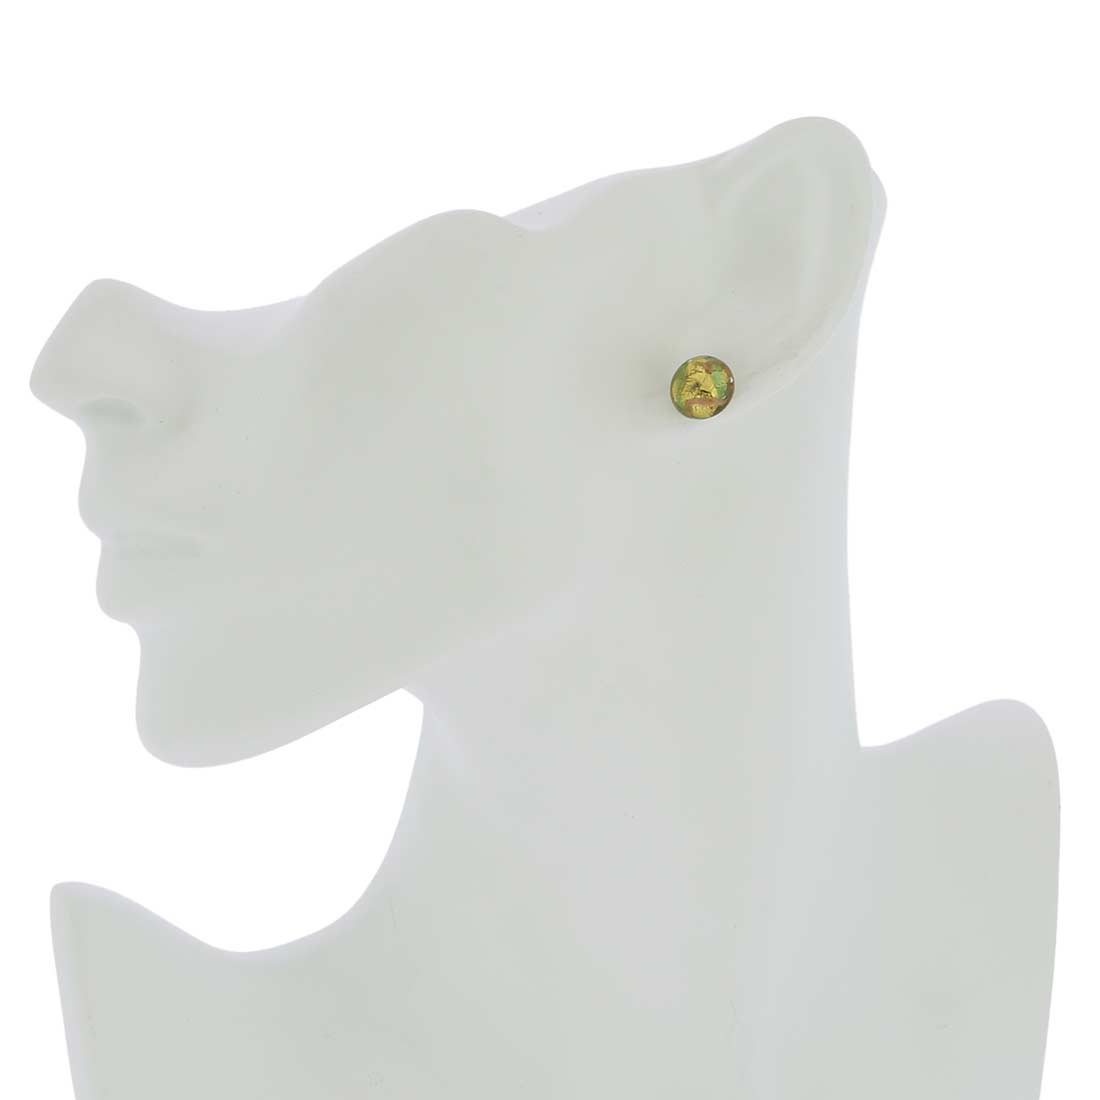 Murano Button Stud Earrings - Gold and Aqua